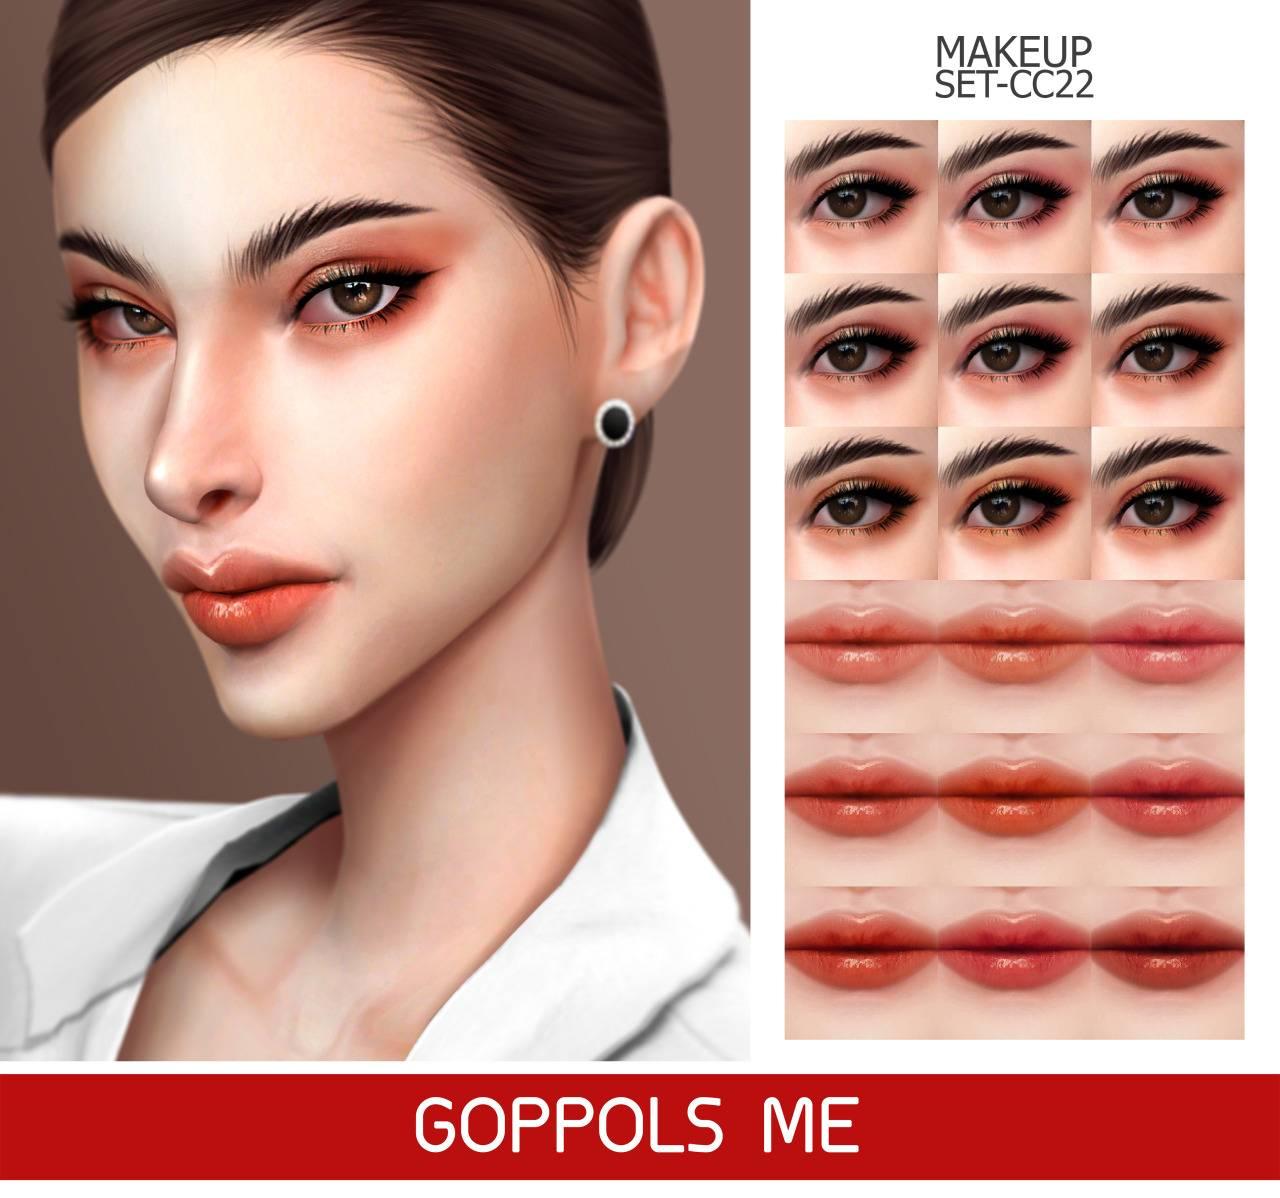 Набор косметики - MAKEUP SET CC22